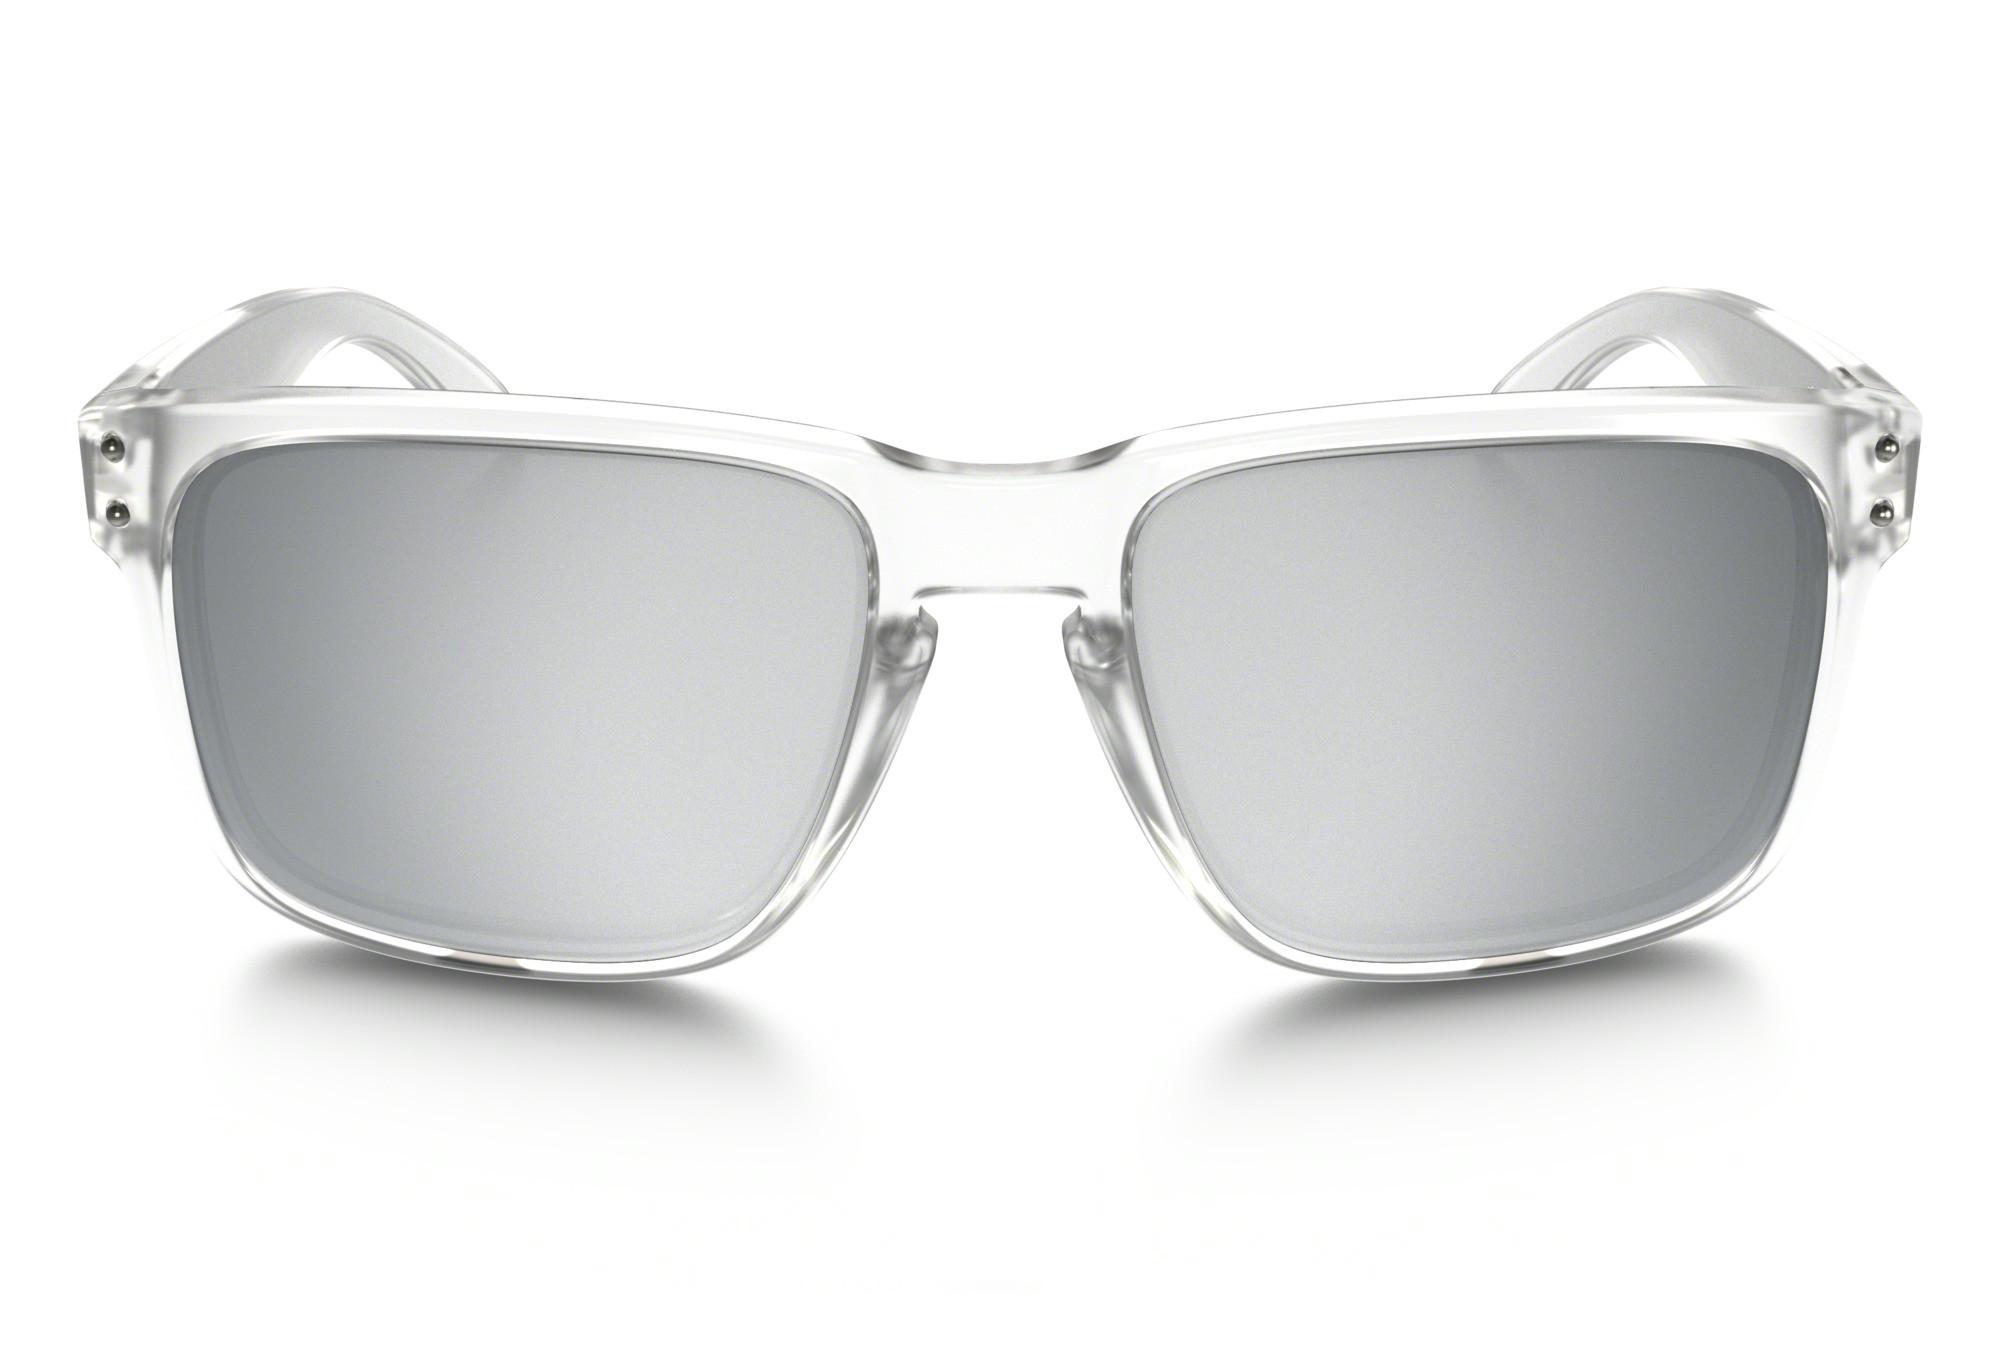 Chrome Holbrook Transparent Lunettes Oo9102 Ref Oakley A2 Iridium 8nk0OXNwP